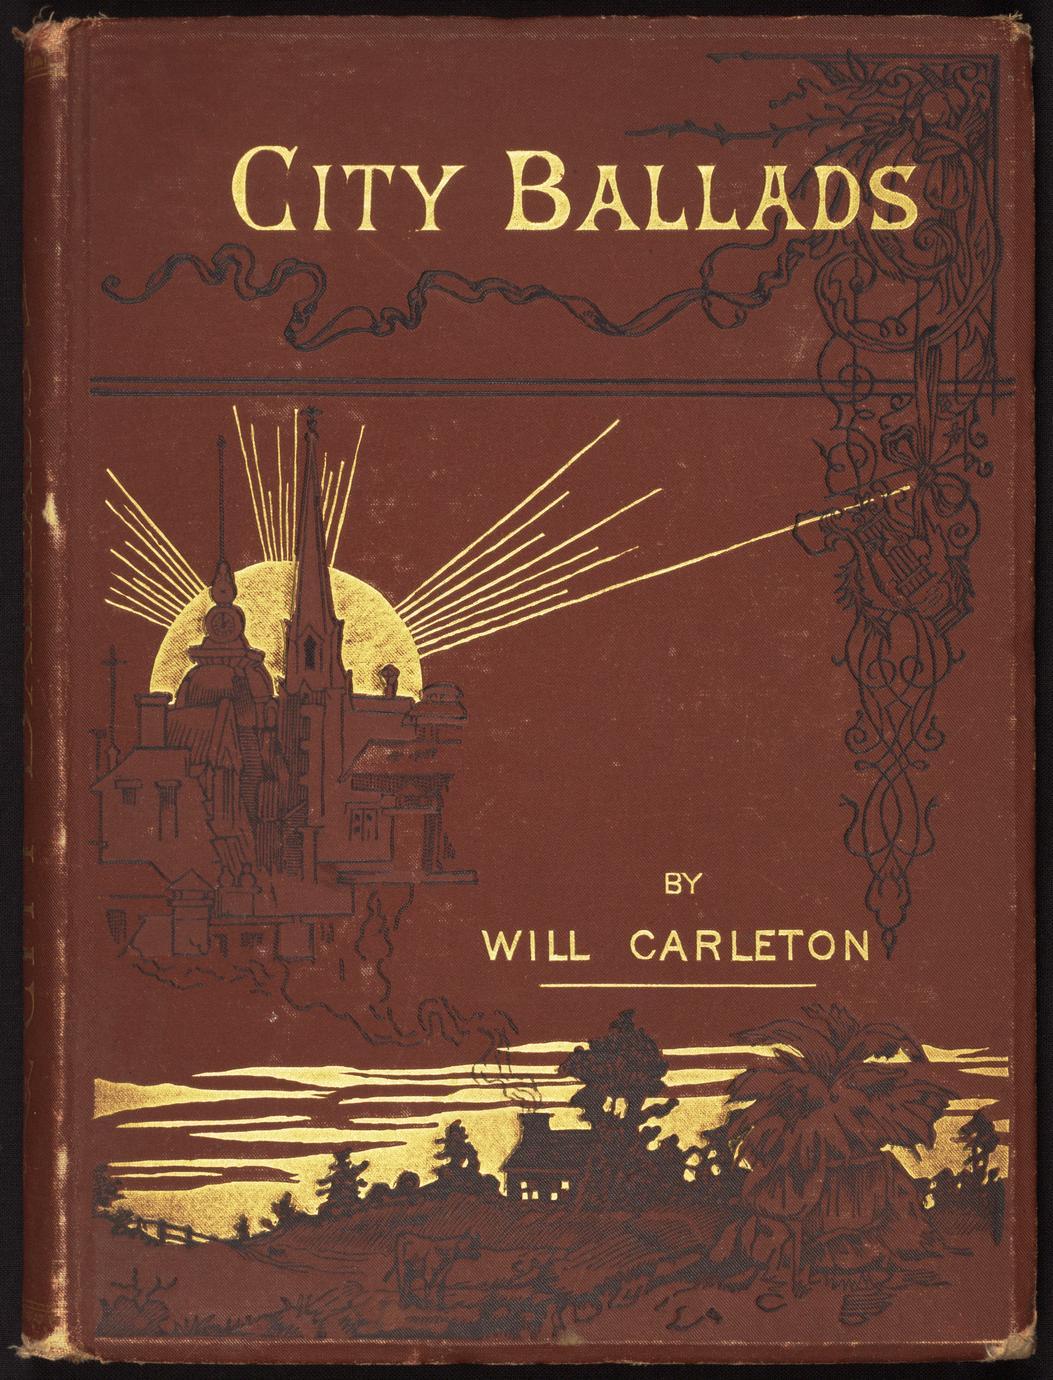 City ballads (1 of 4)